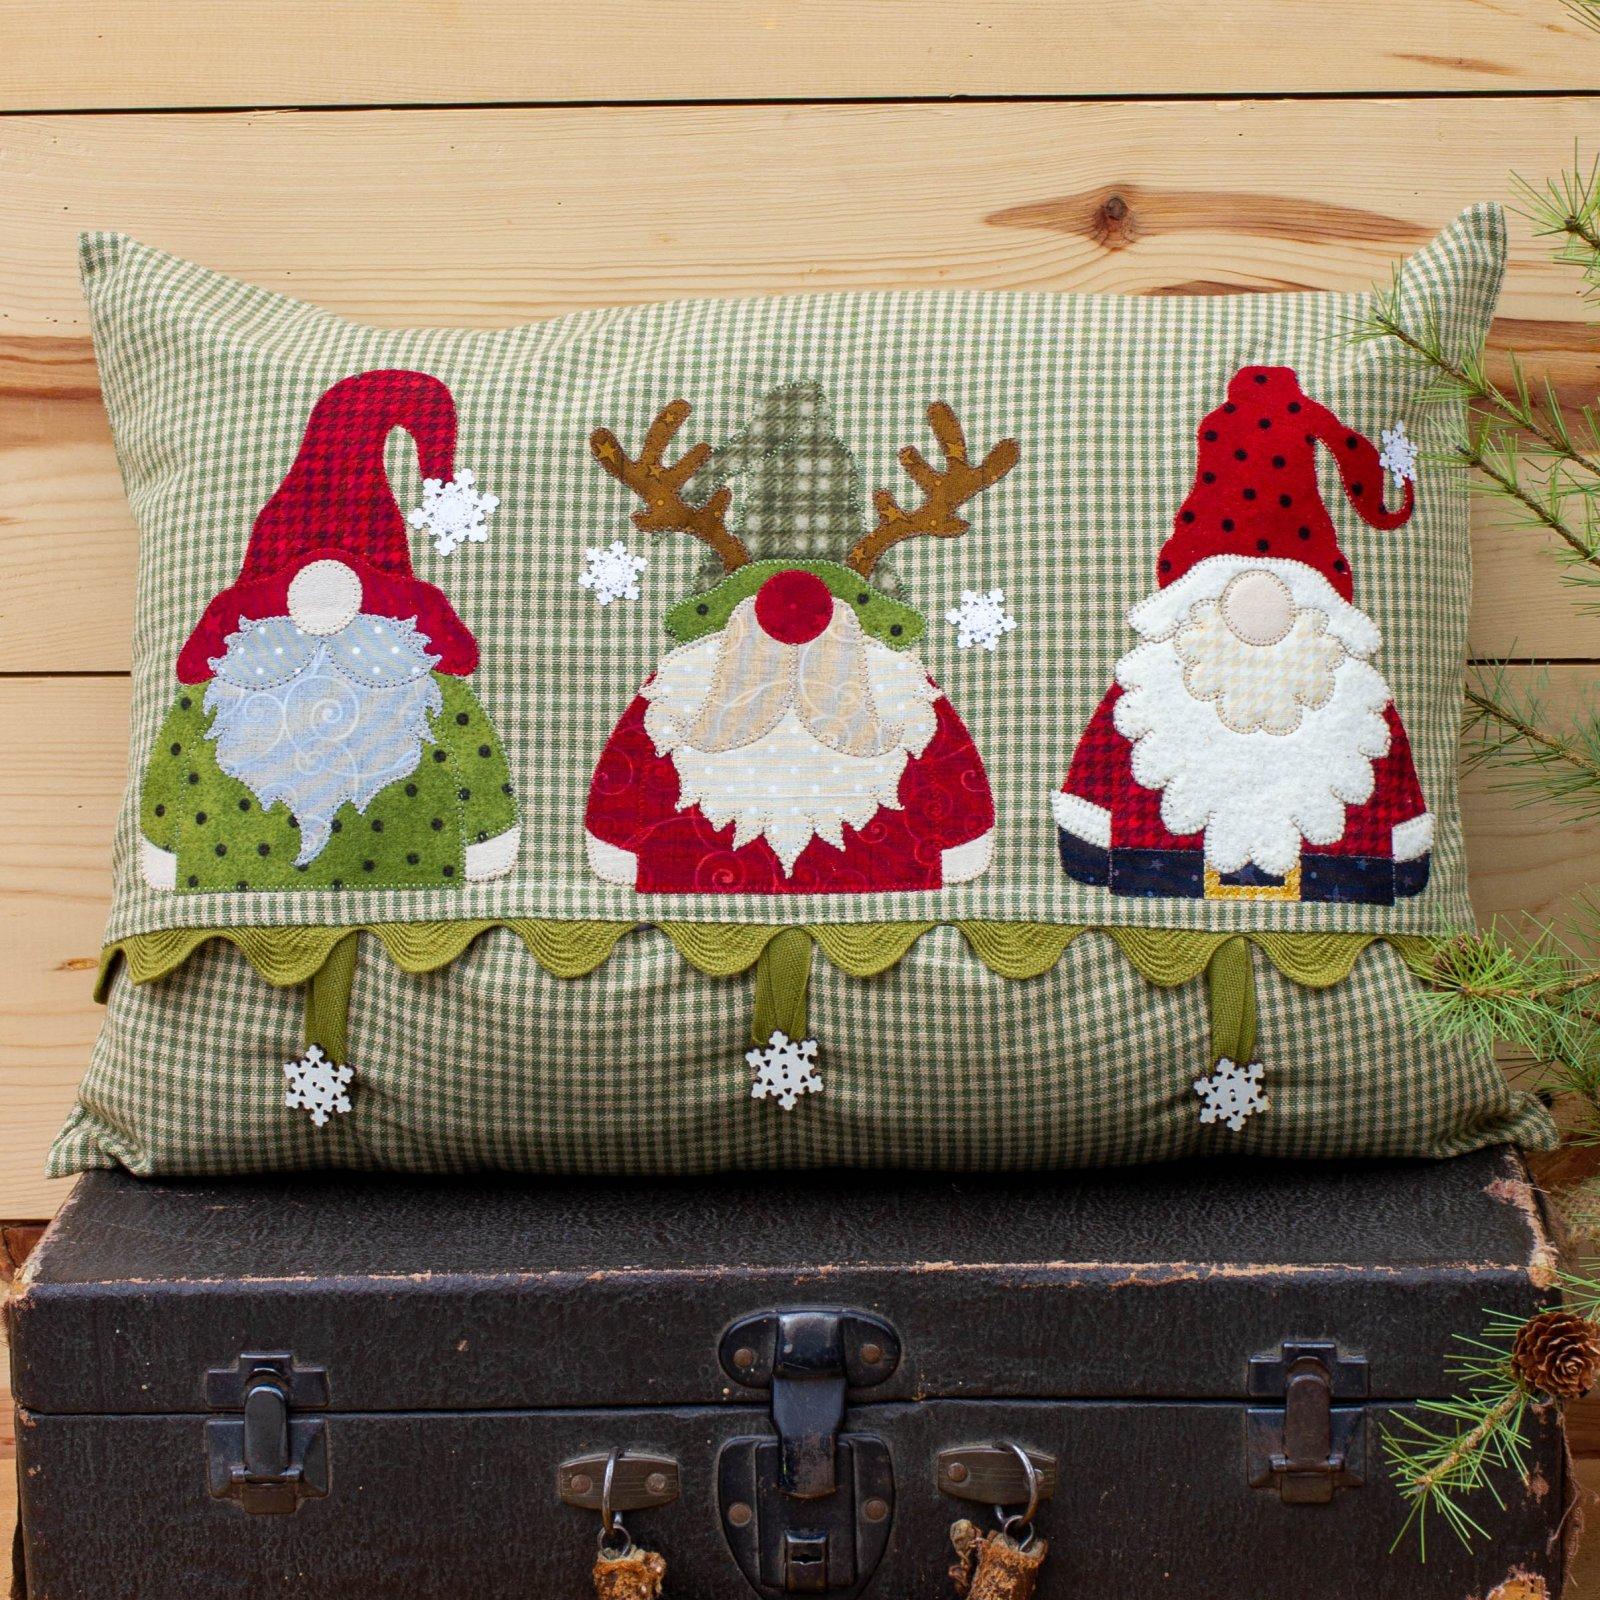 Gnome Trio Applique Pillow Cover Kit